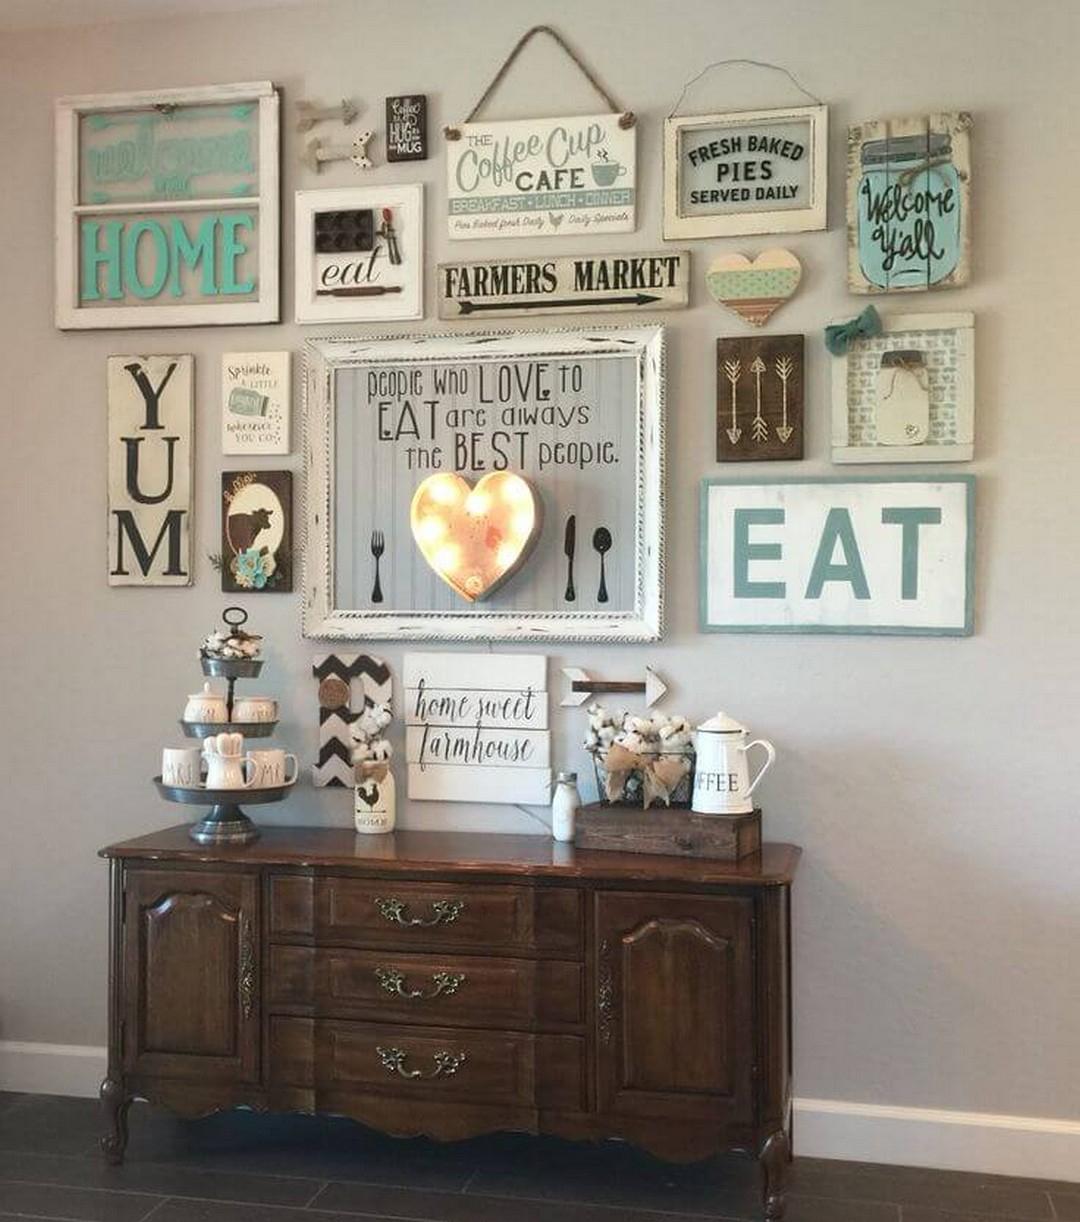 Diy Farmhouse Living Room Wall Decor – Goodnewsarchitecture Inside Eat Rustic Farmhouse Wood Wall Decor (Gallery 29 of 30)